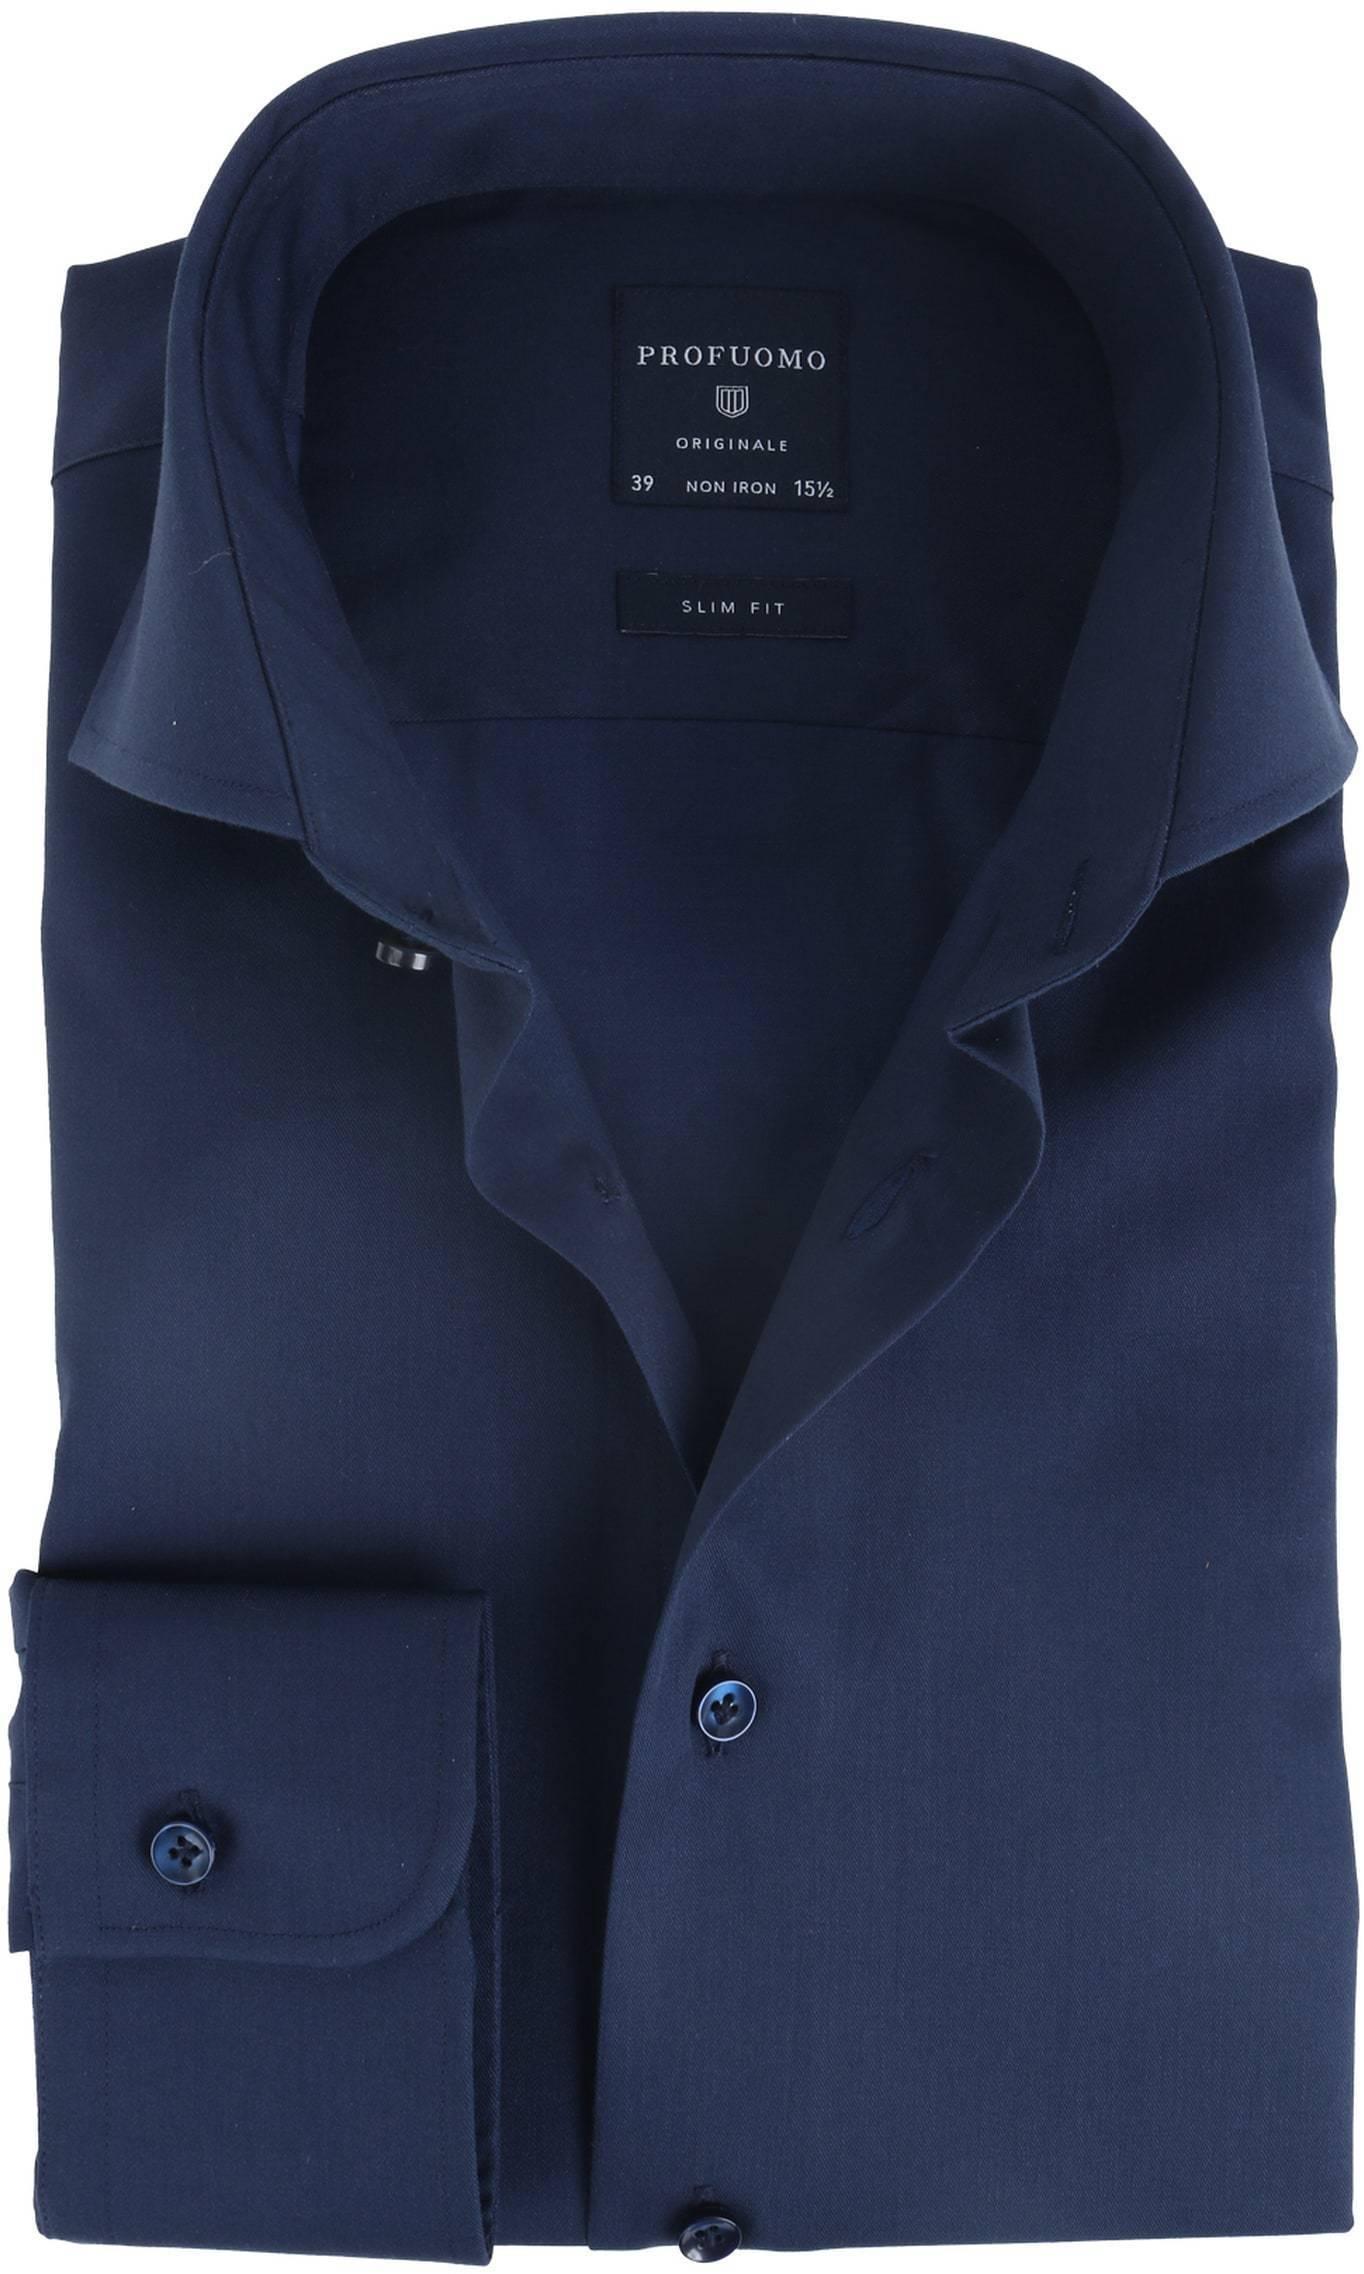 Profuomo Shirt Slim Fit Navy foto 0